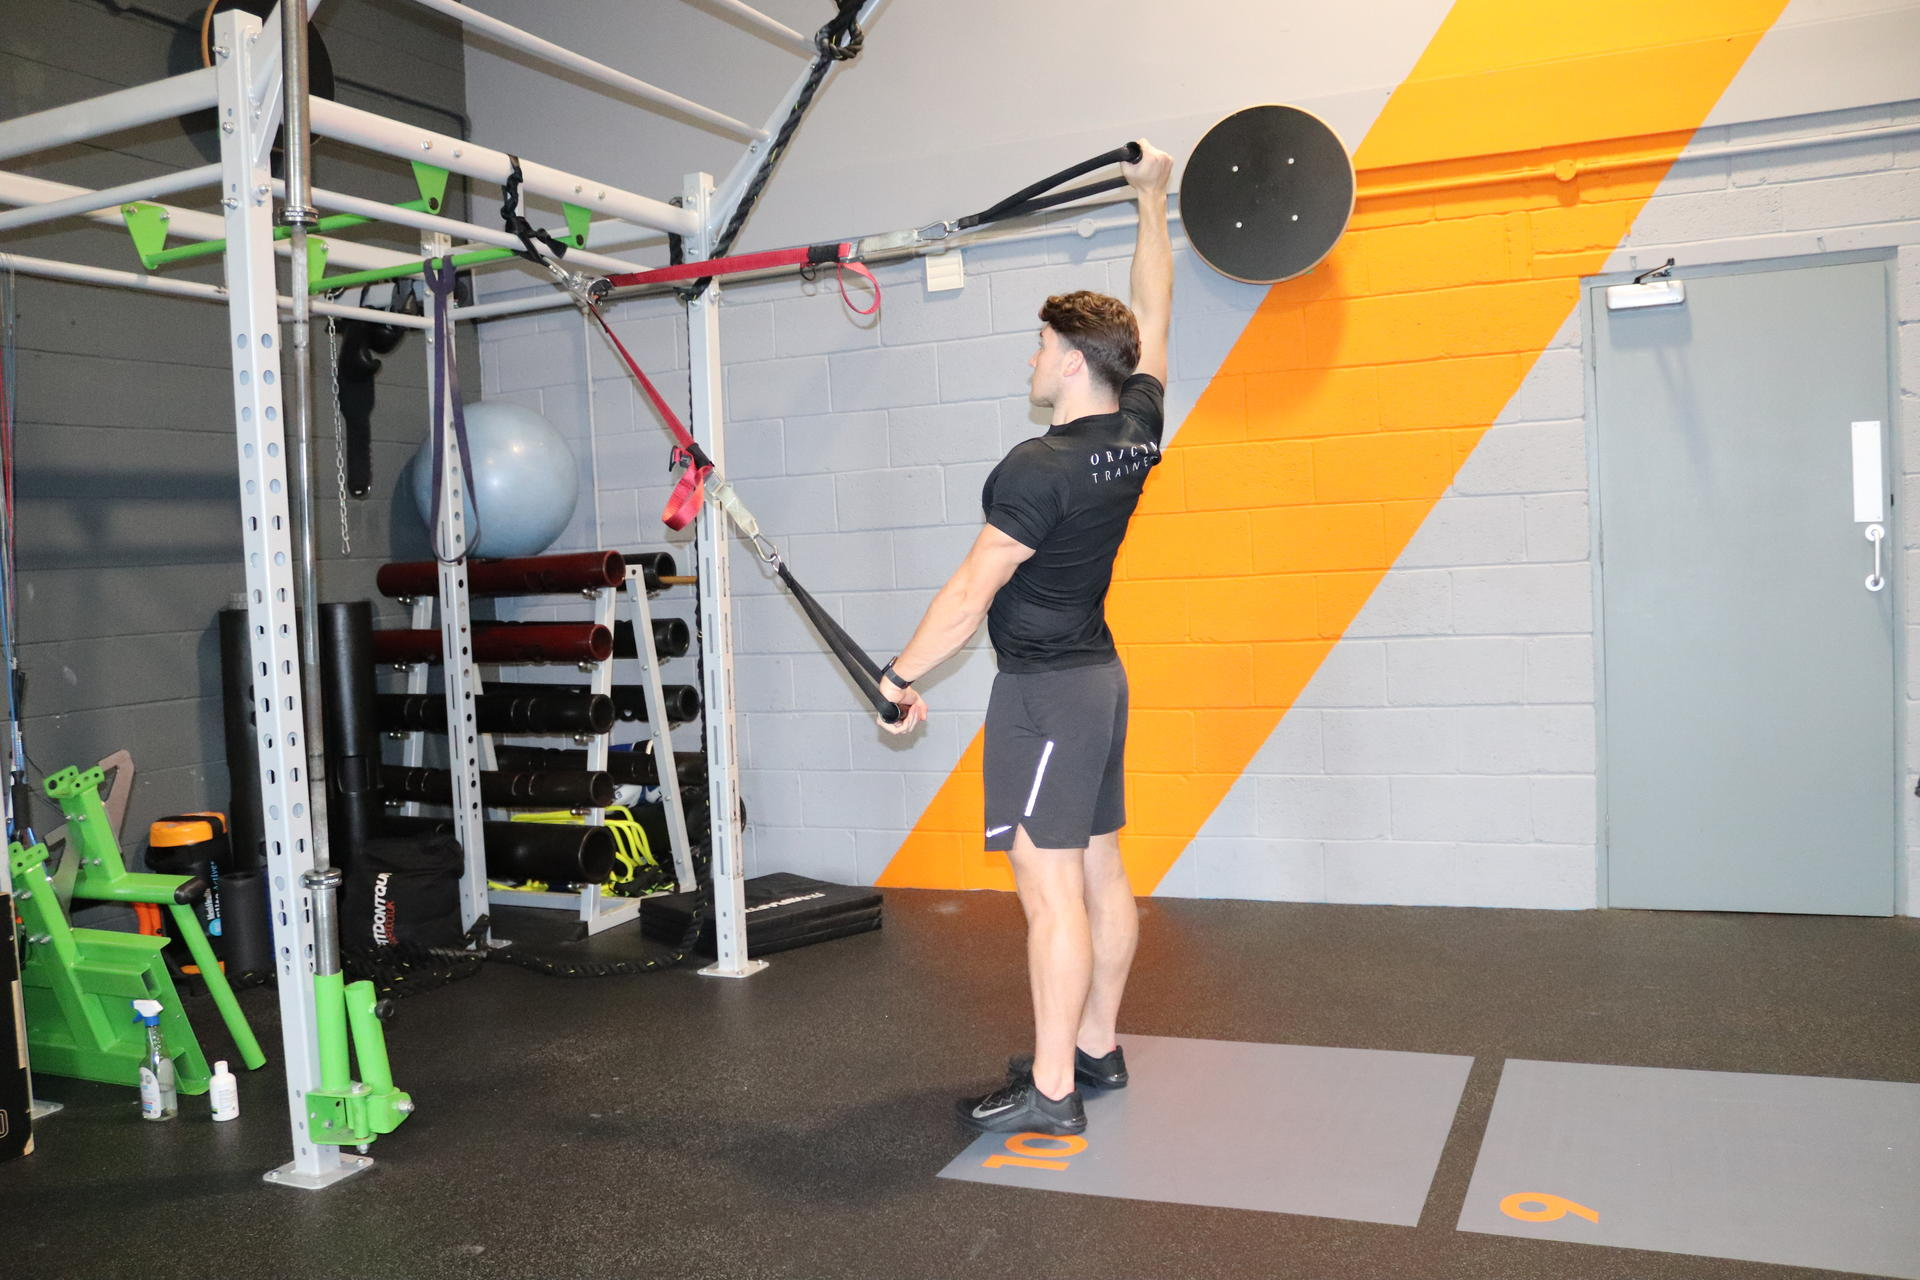 trx warm up exercises